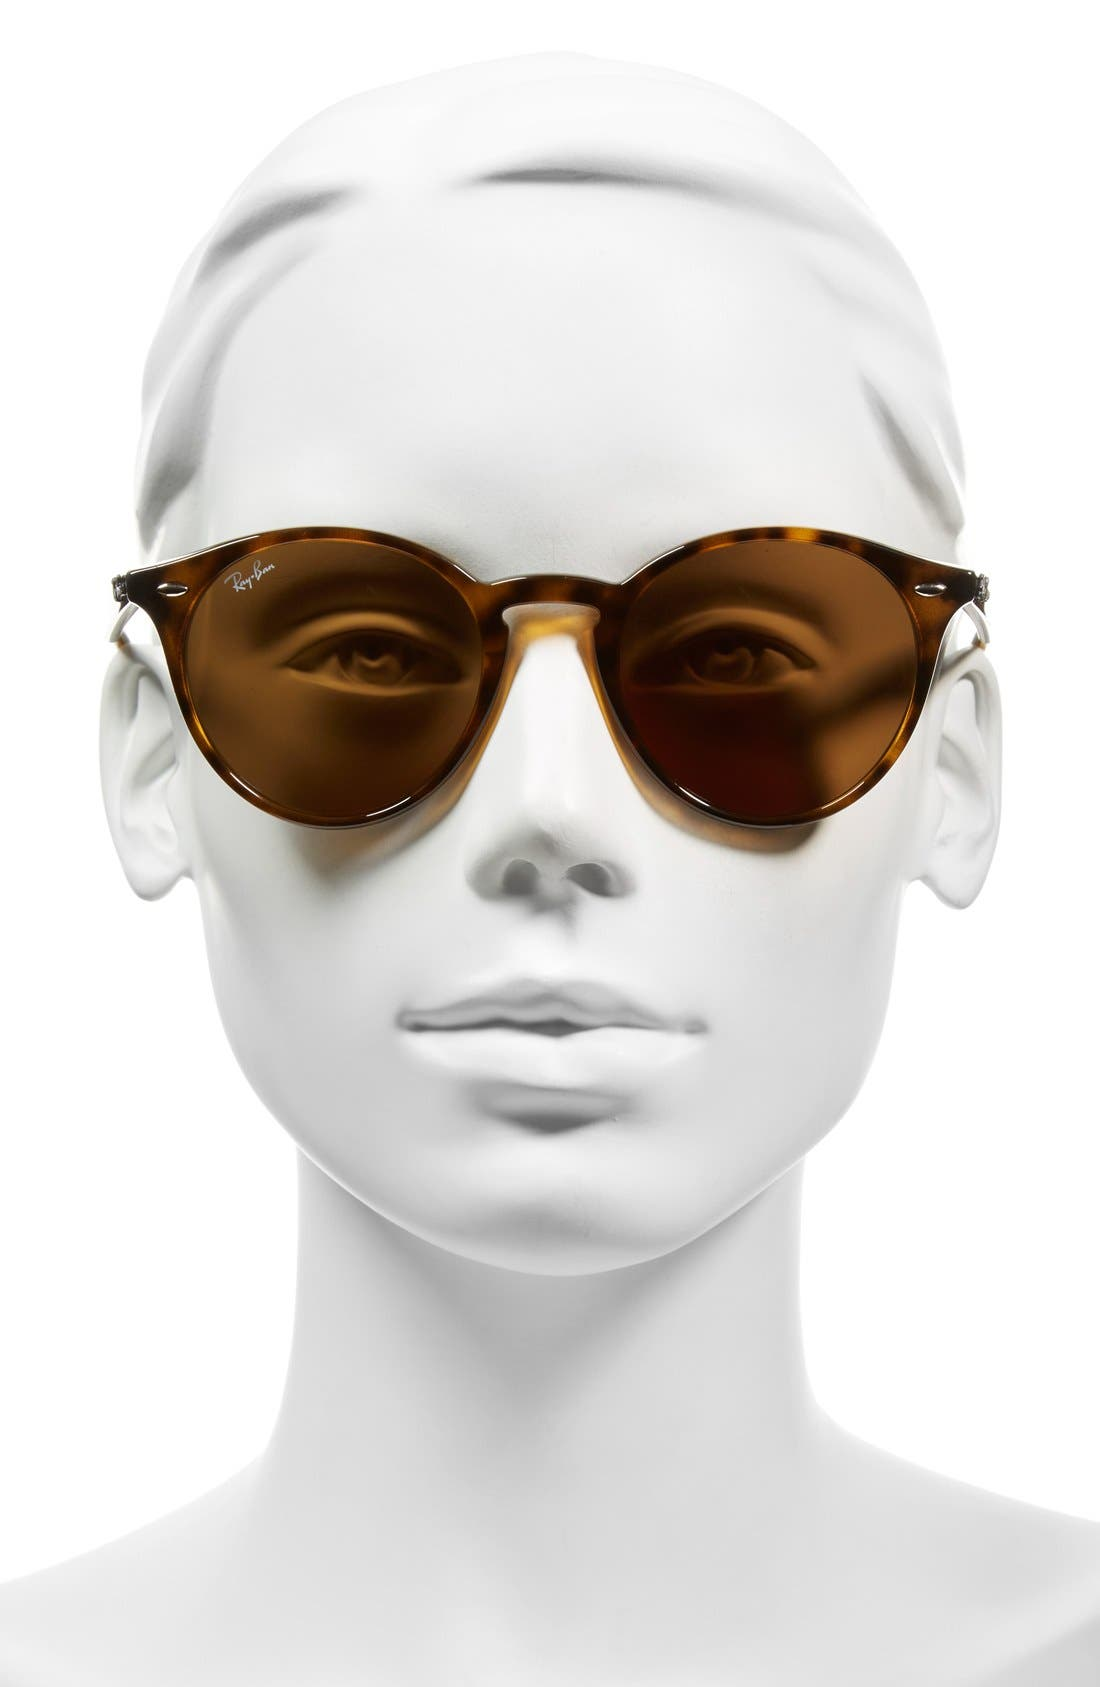 Highstreet 51mm Round Sunglasses,                             Alternate thumbnail 2, color,                             Dark Havana